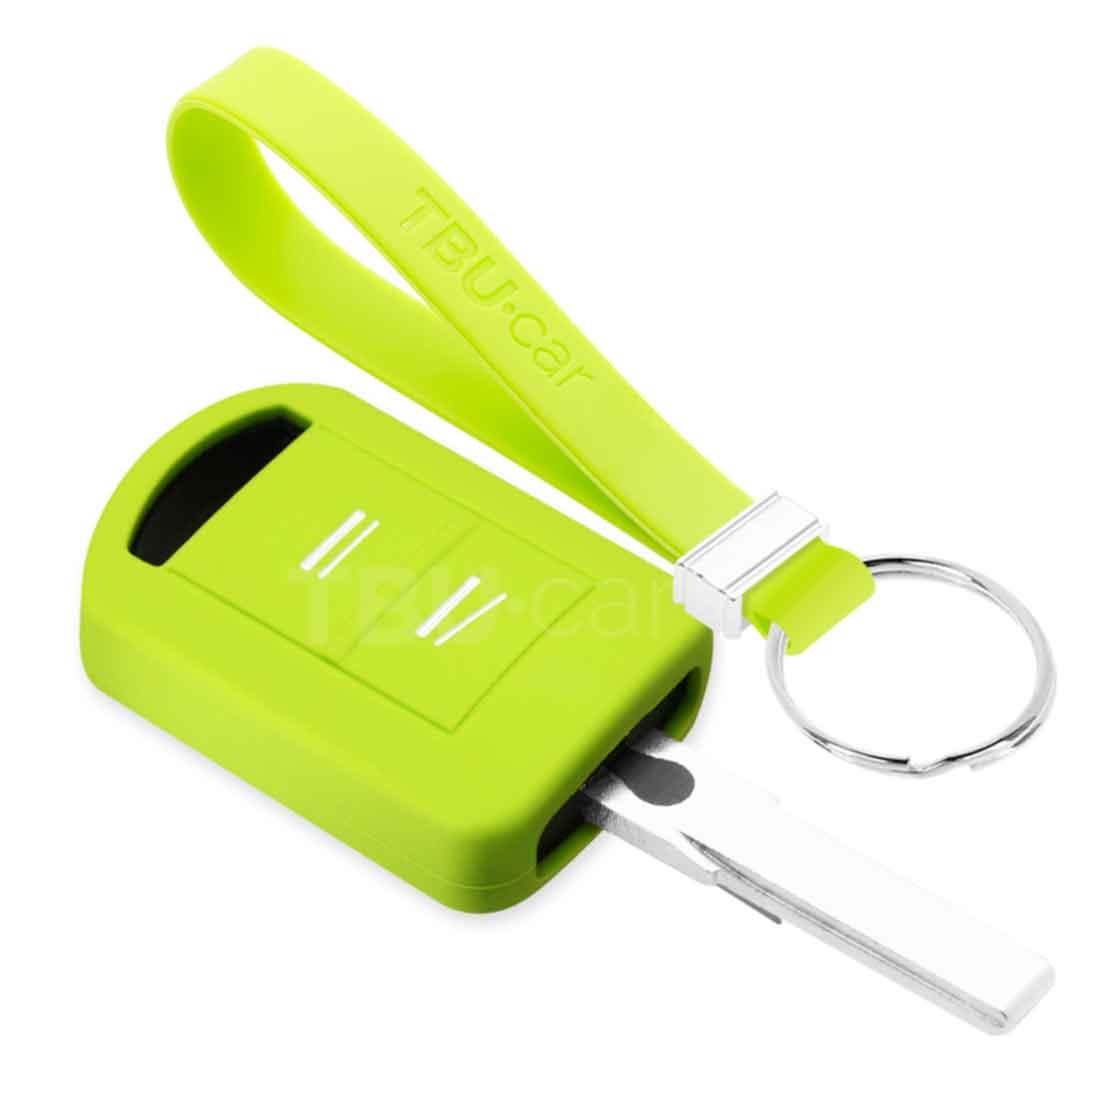 TBU car TBU car Autoschlüssel Hülle kompatibel mit Vauxhall 2 Tasten - Schutzhülle aus Silikon - Auto Schlüsselhülle Cover in Lindgrün